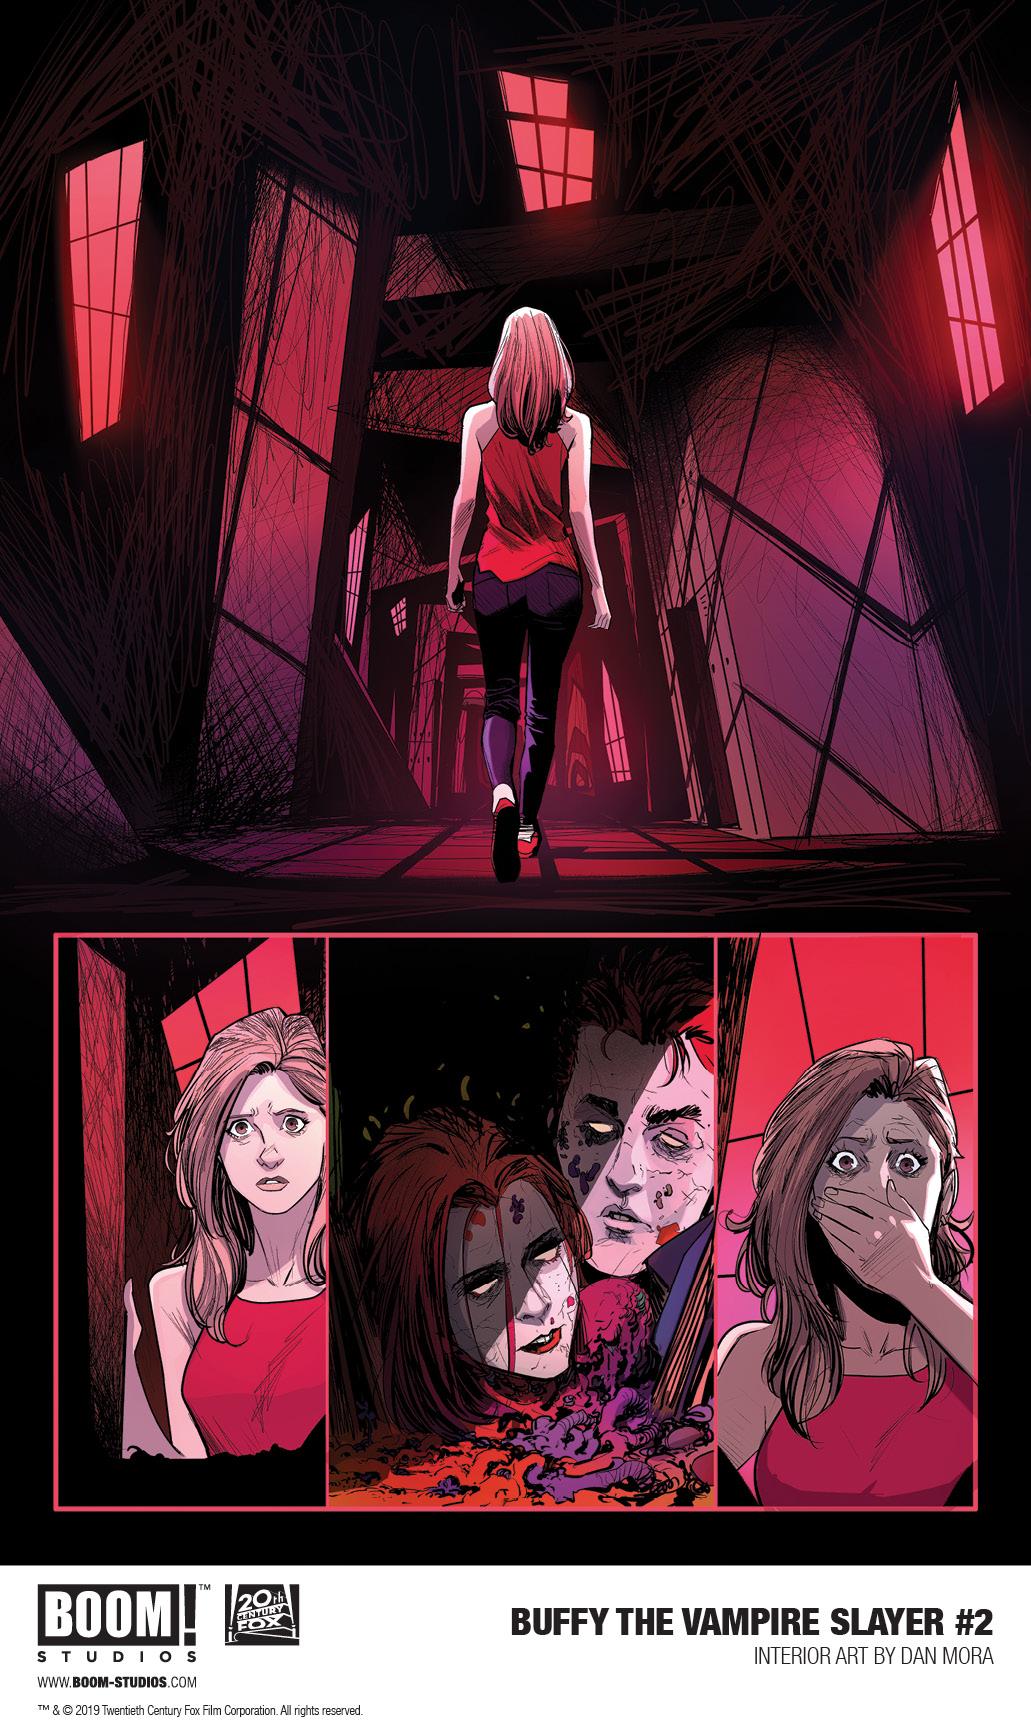 http://www.pastemagazine.com/articles/Buffy_002_InteriorArt_001_PROMO.jpg